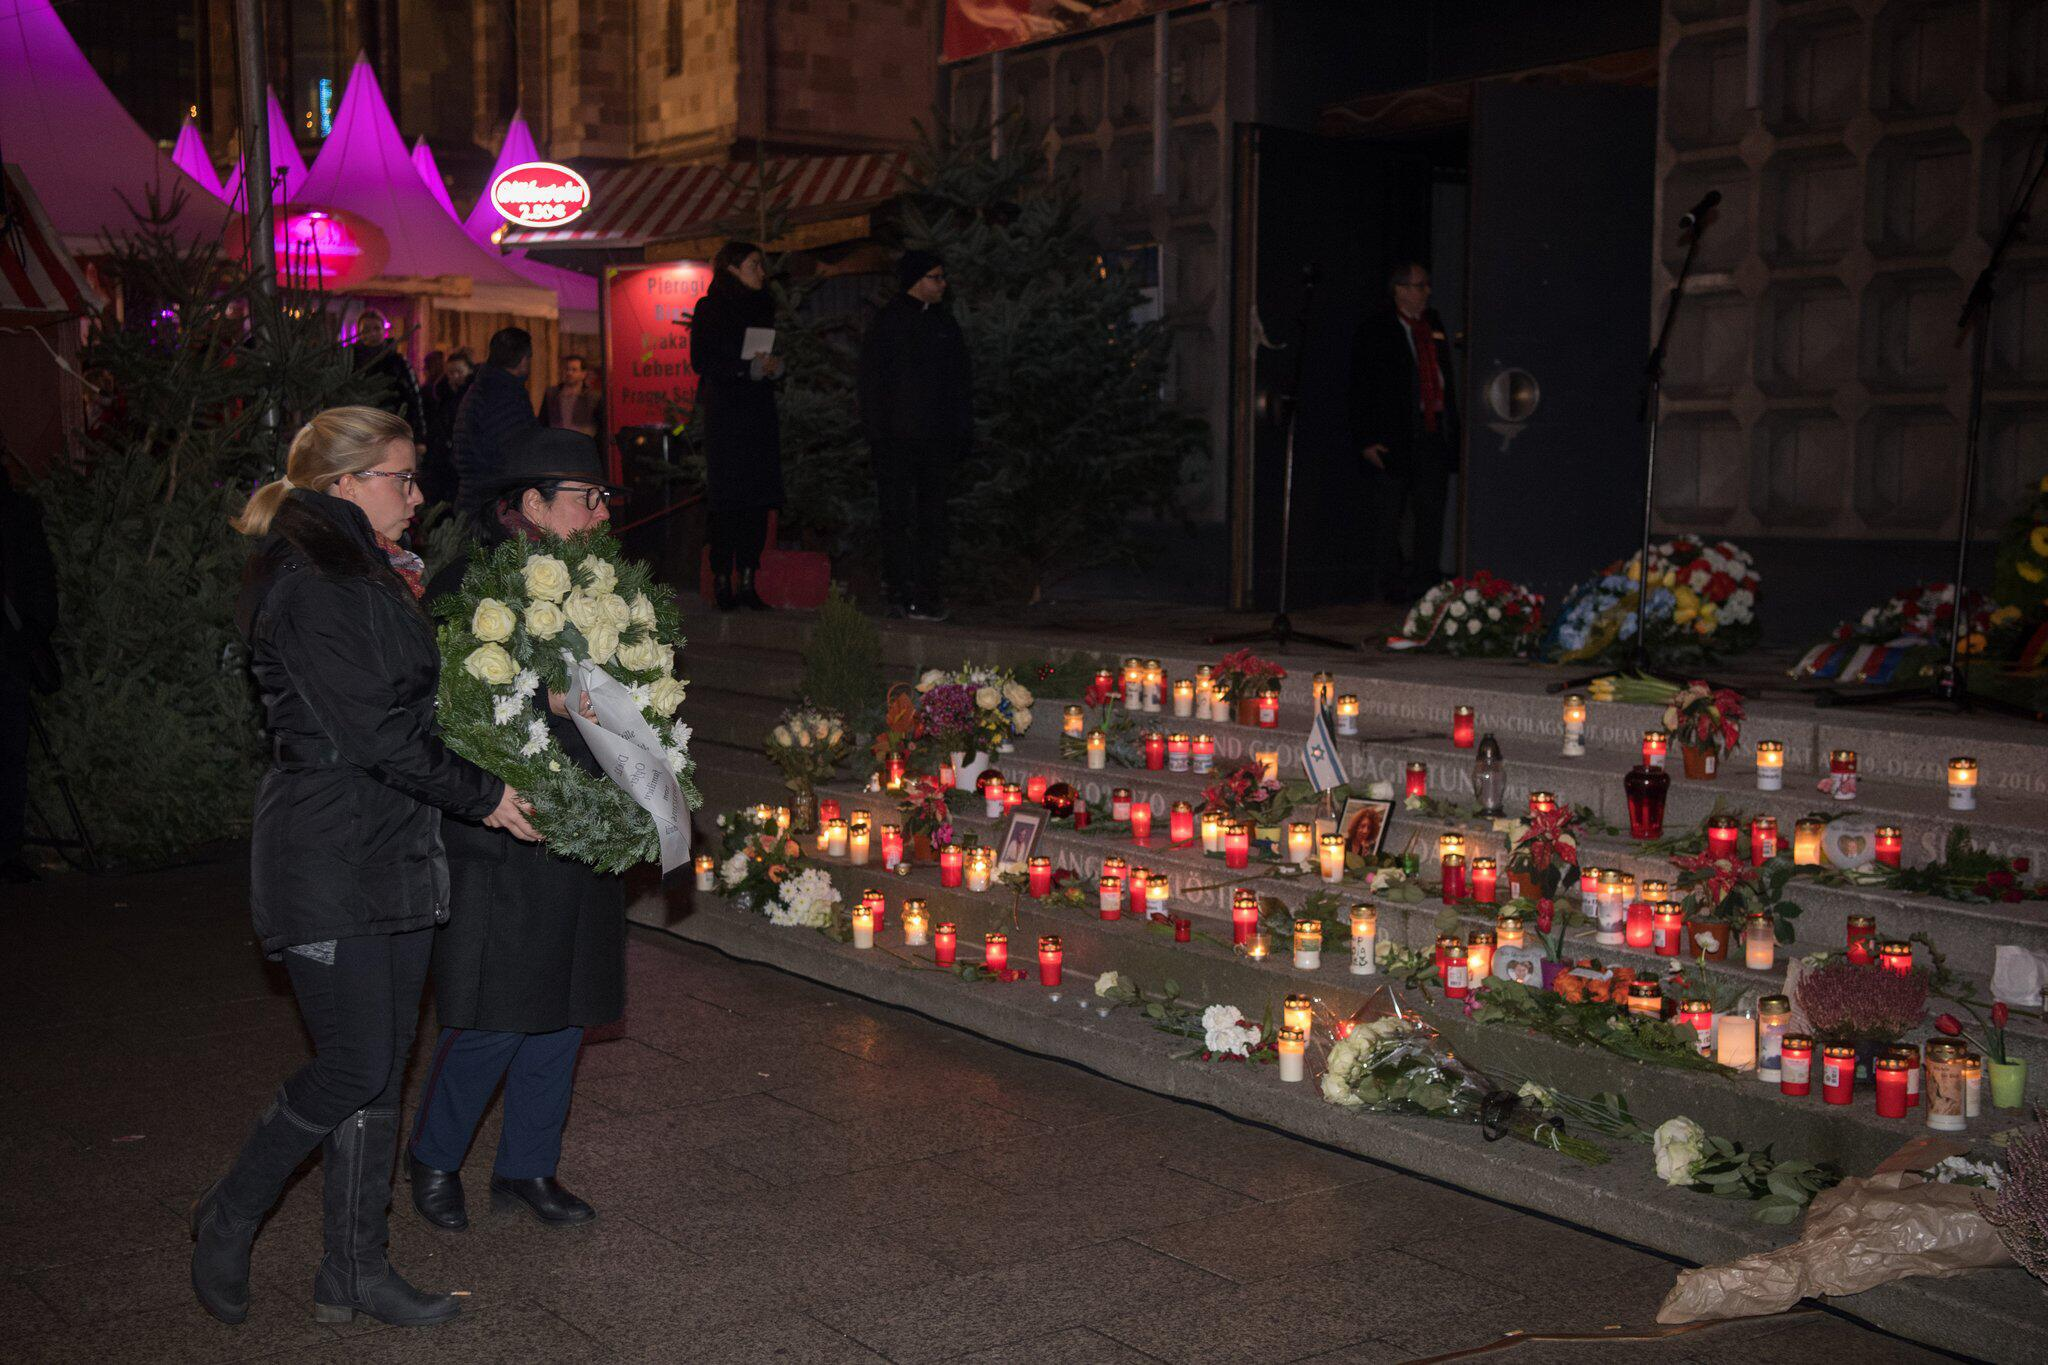 Bild zu Gedenken an Opfer des Terroranschlags an der Gedächtniskirche